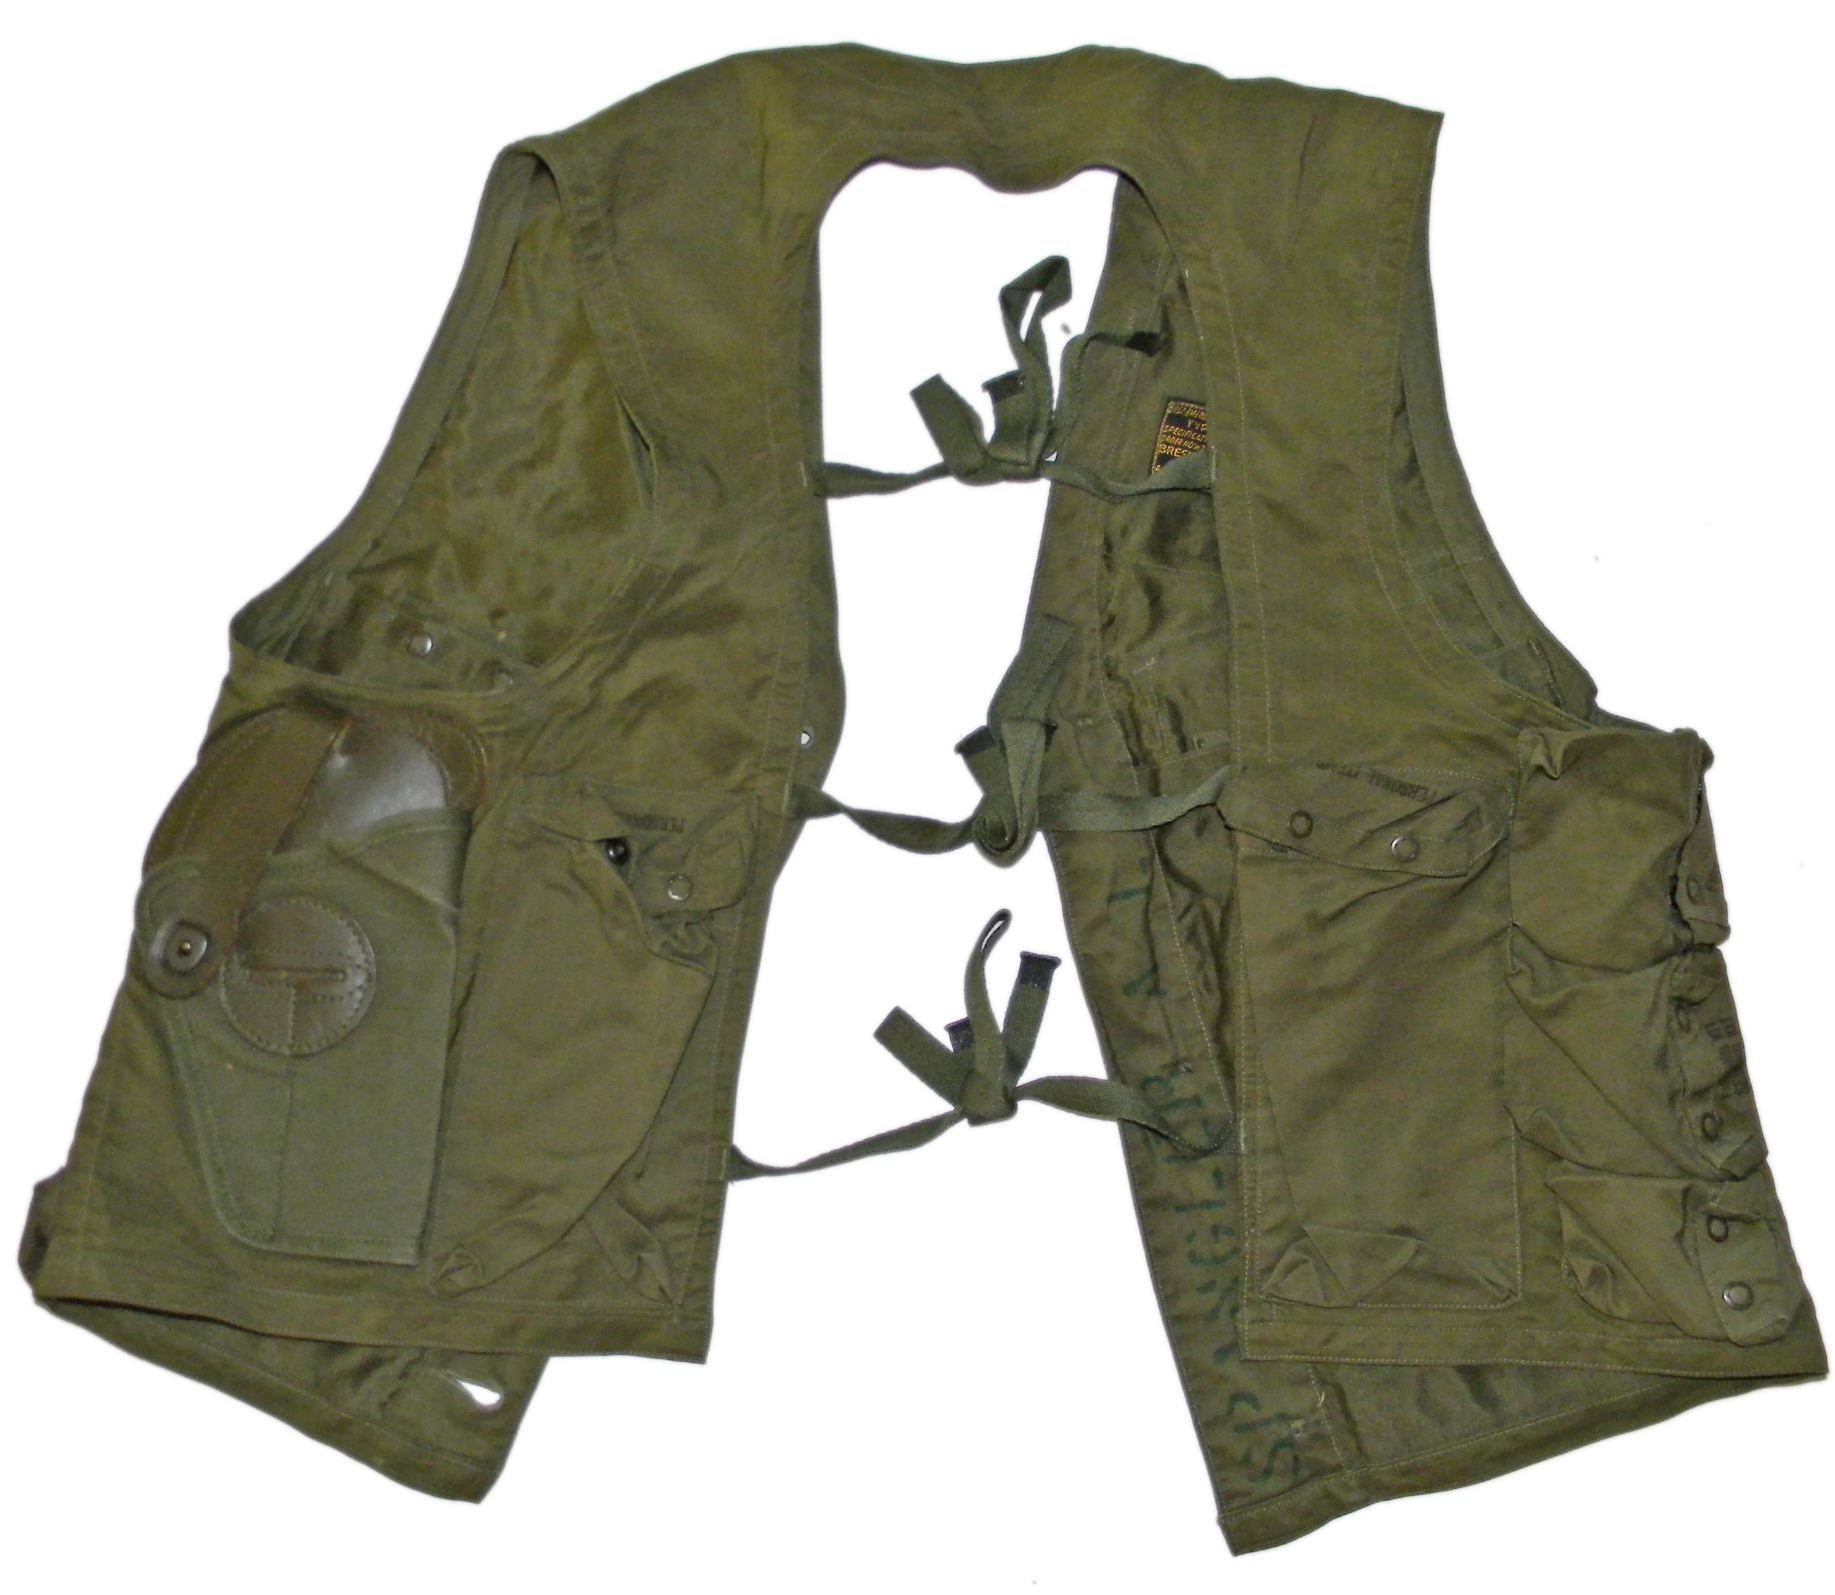 AAF C-1 vest + contents